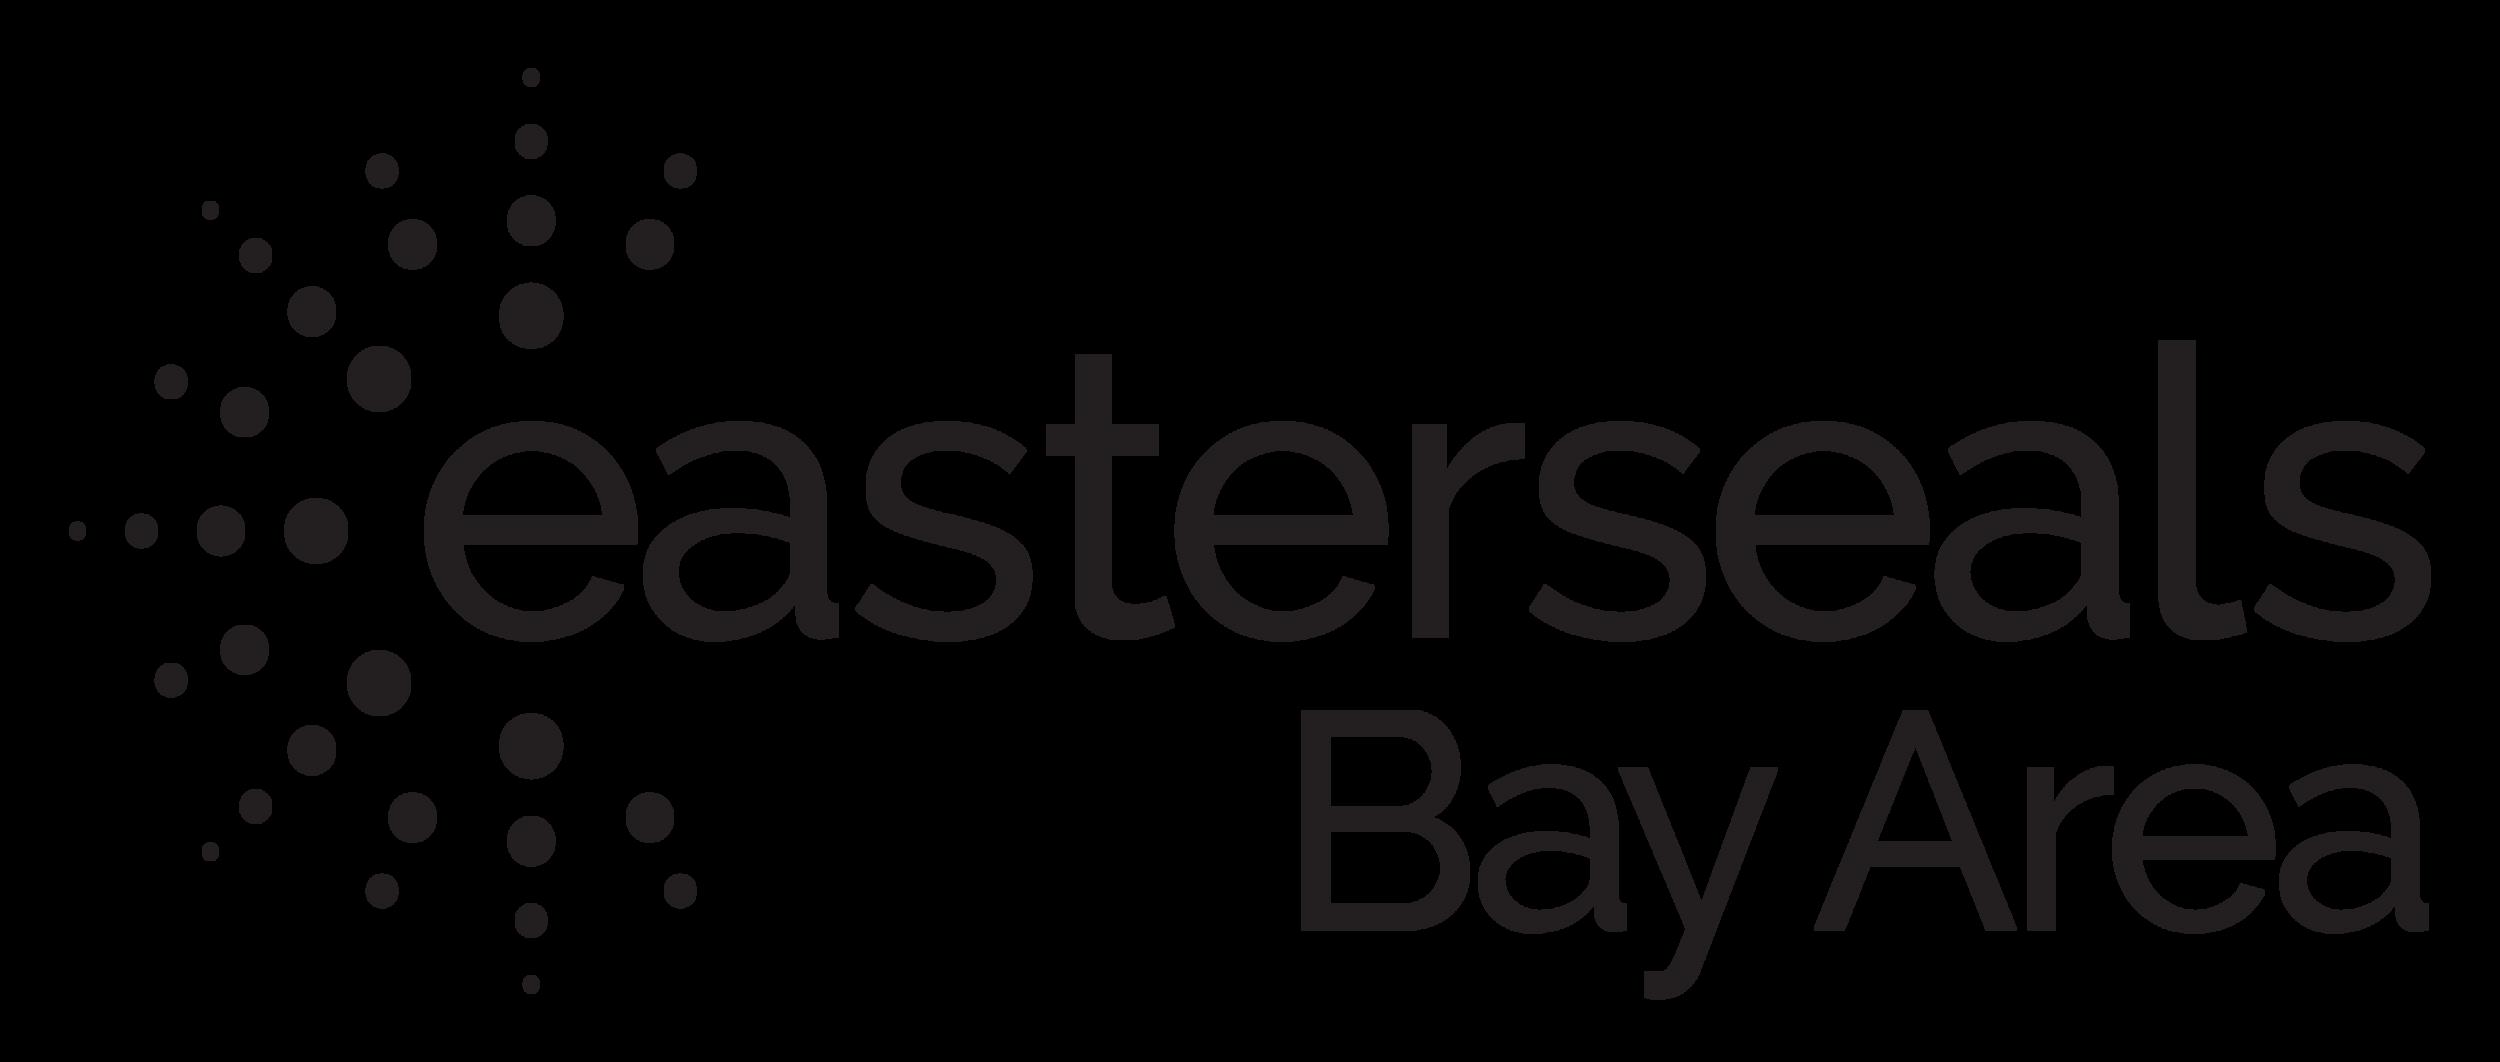 Bay Area_RGB_Black Logo.png